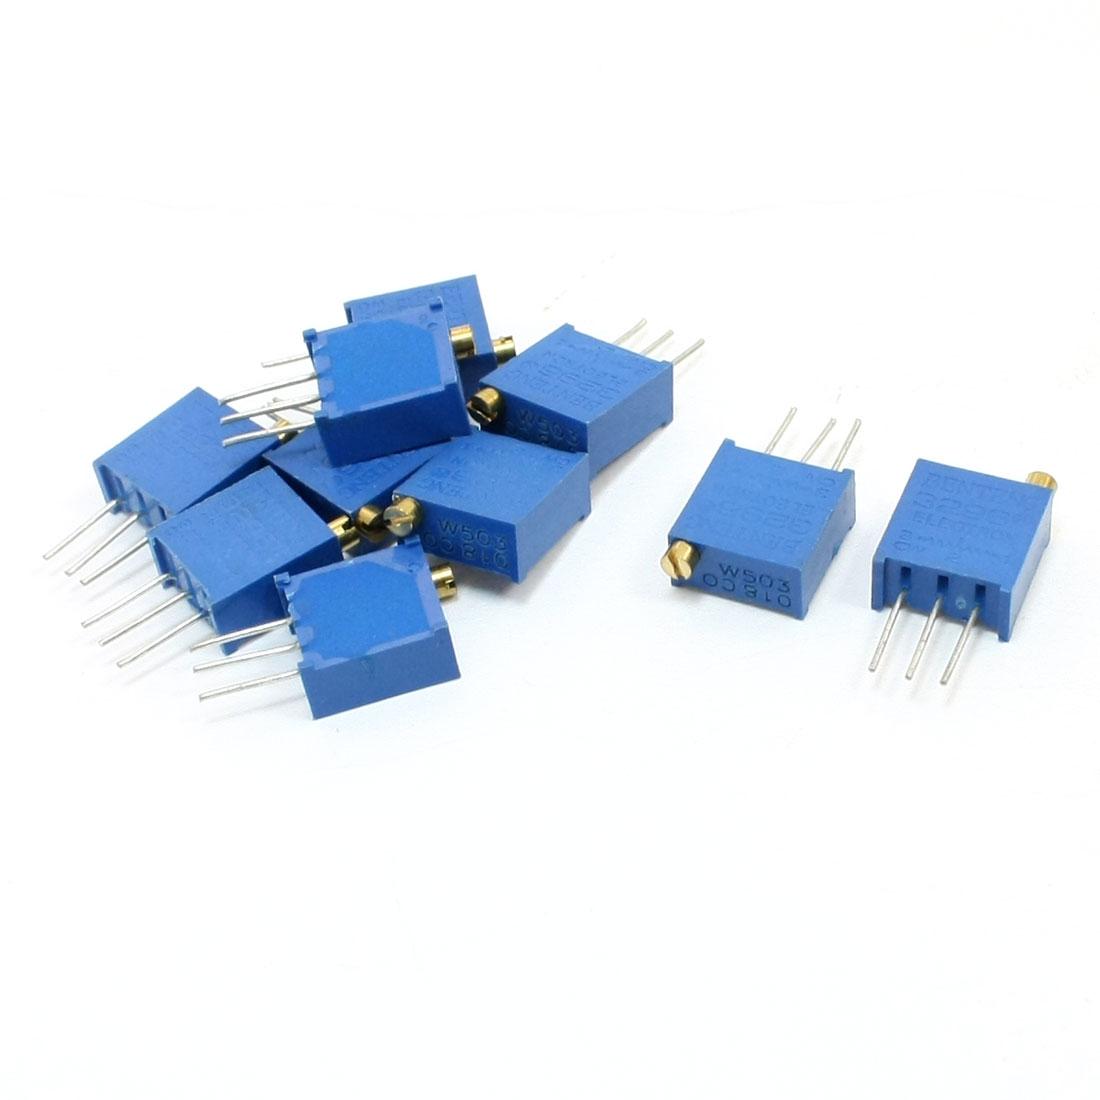 50K Ohm 3296W-503 Top Adjustment Linear Cermet Potentiometer 10 Pcs